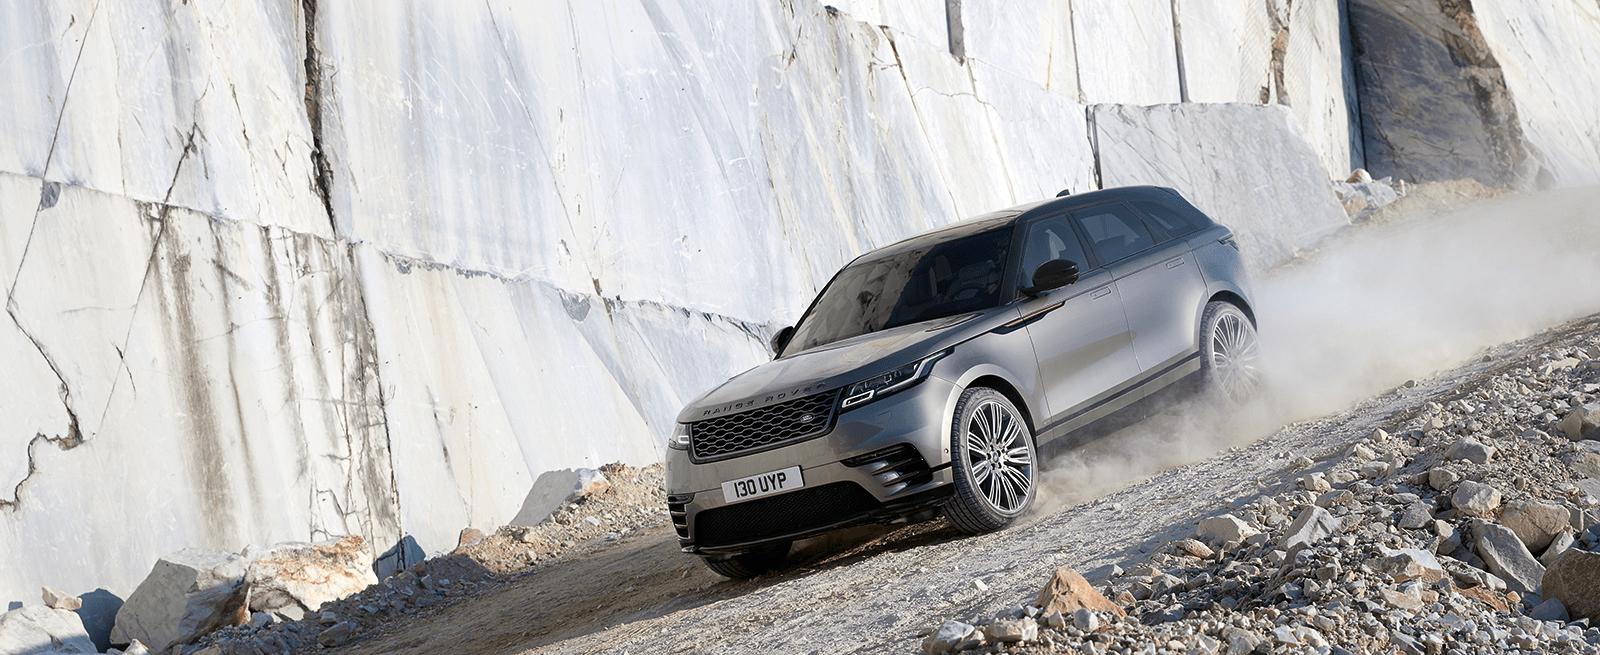 Silver Range Rover Velar Driving Off-Road Through a Quarry